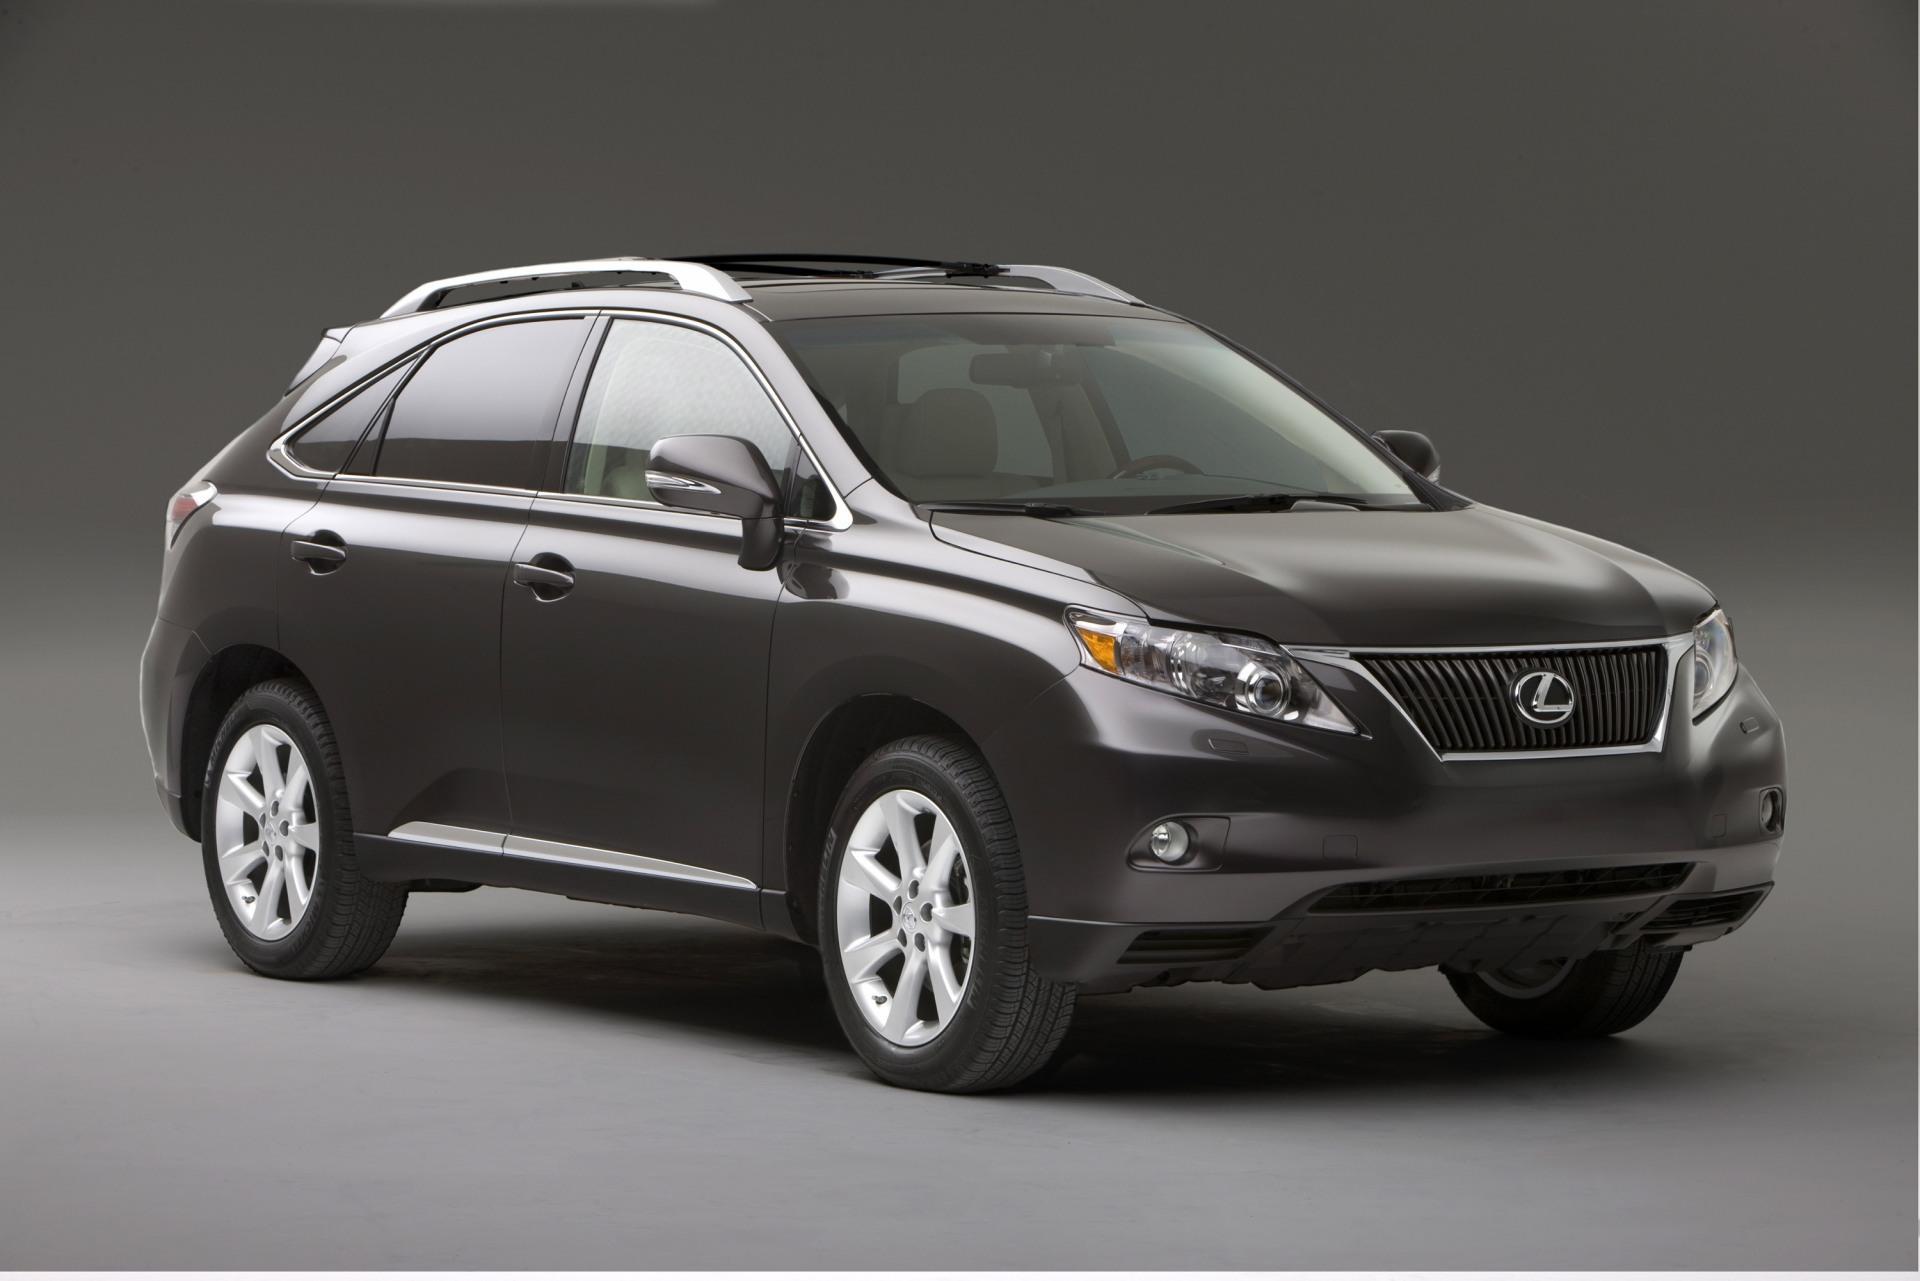 exterior drive rx front lexus base wheel suv price reviews photos features